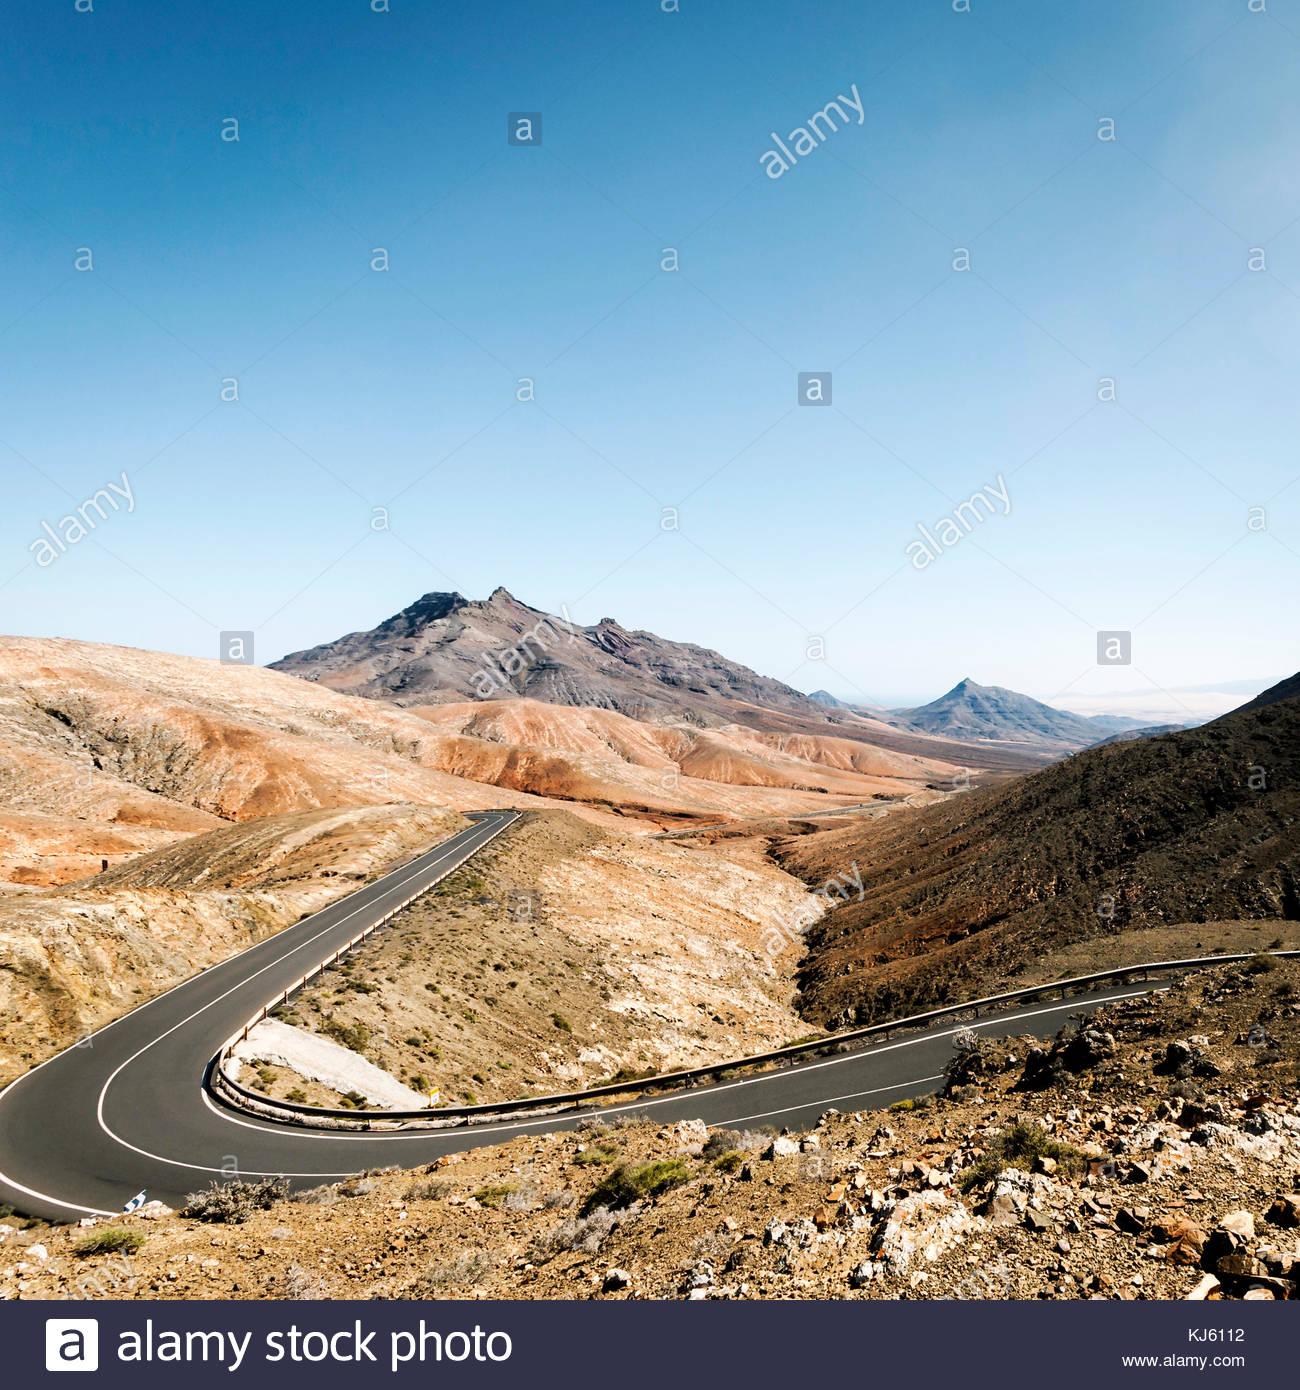 Road through mountain landscape - Stock Image